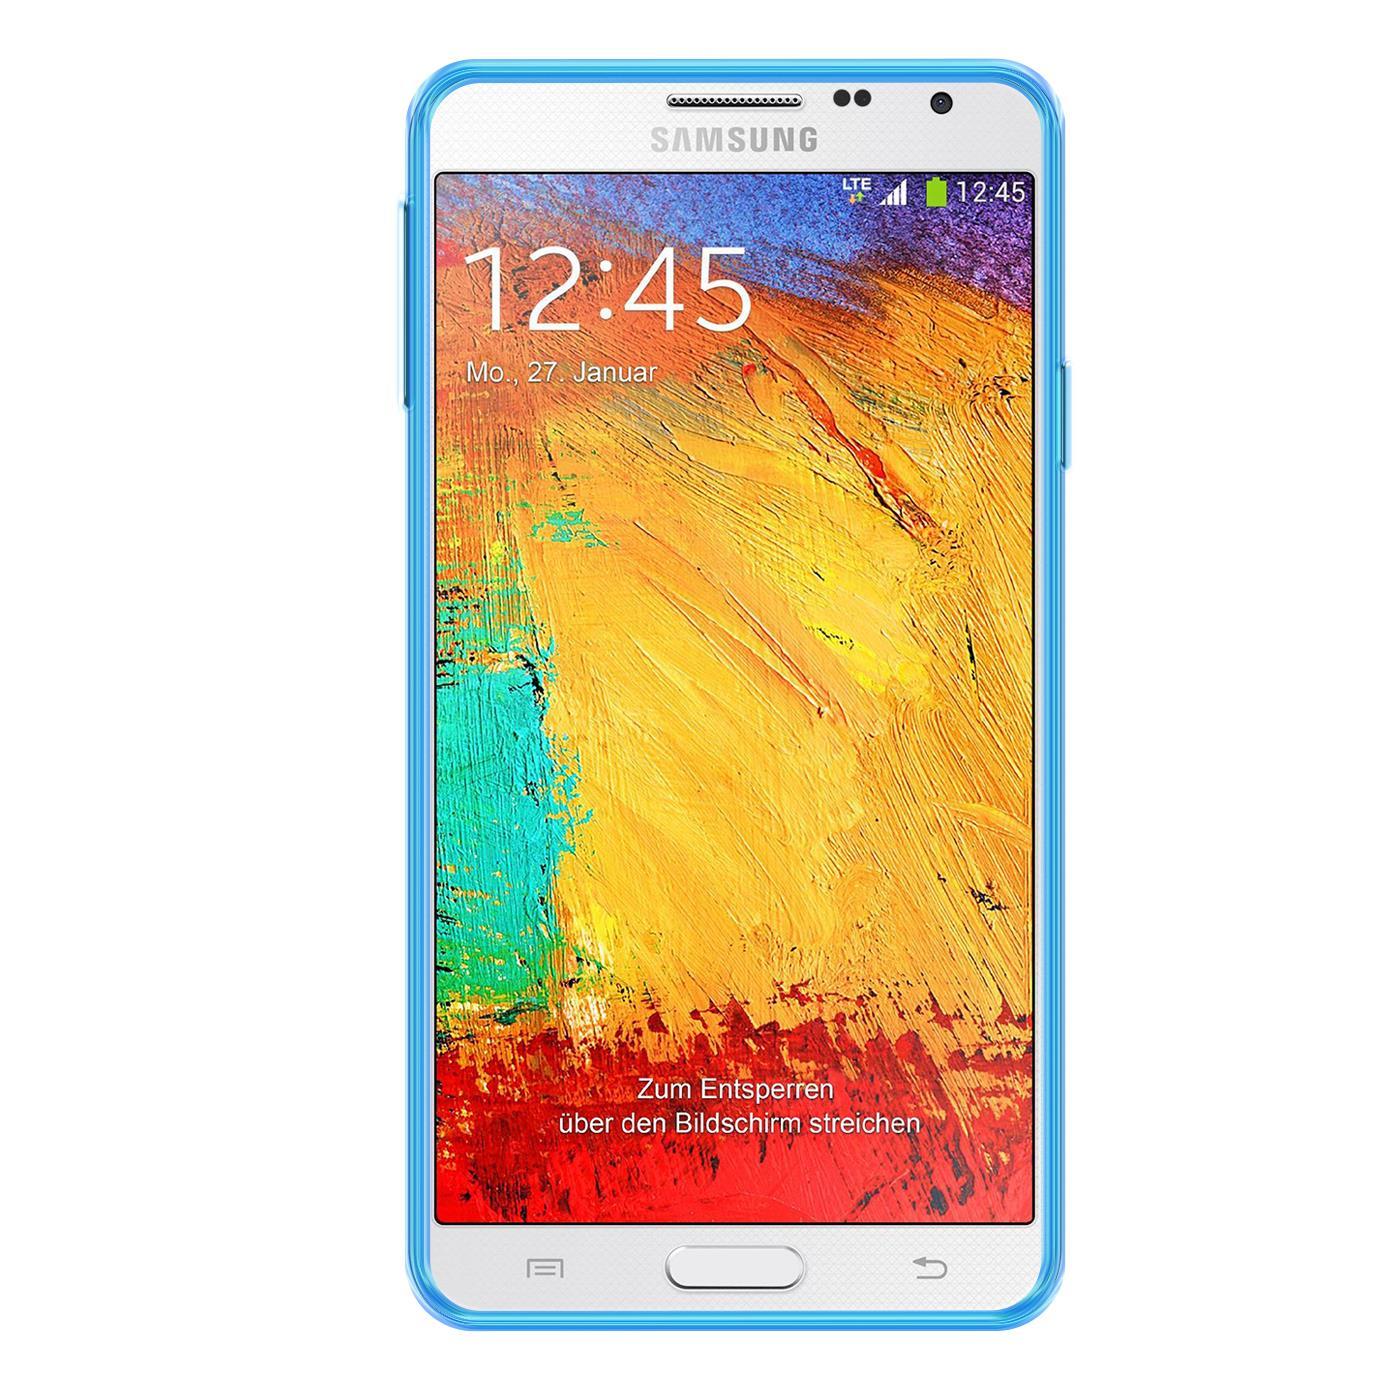 Samsung-Galaxy-Note-4-Thin-Silikon-Klar-Case-Cover-Ultra-Slim-Stossfeste-Gel Indexbild 9